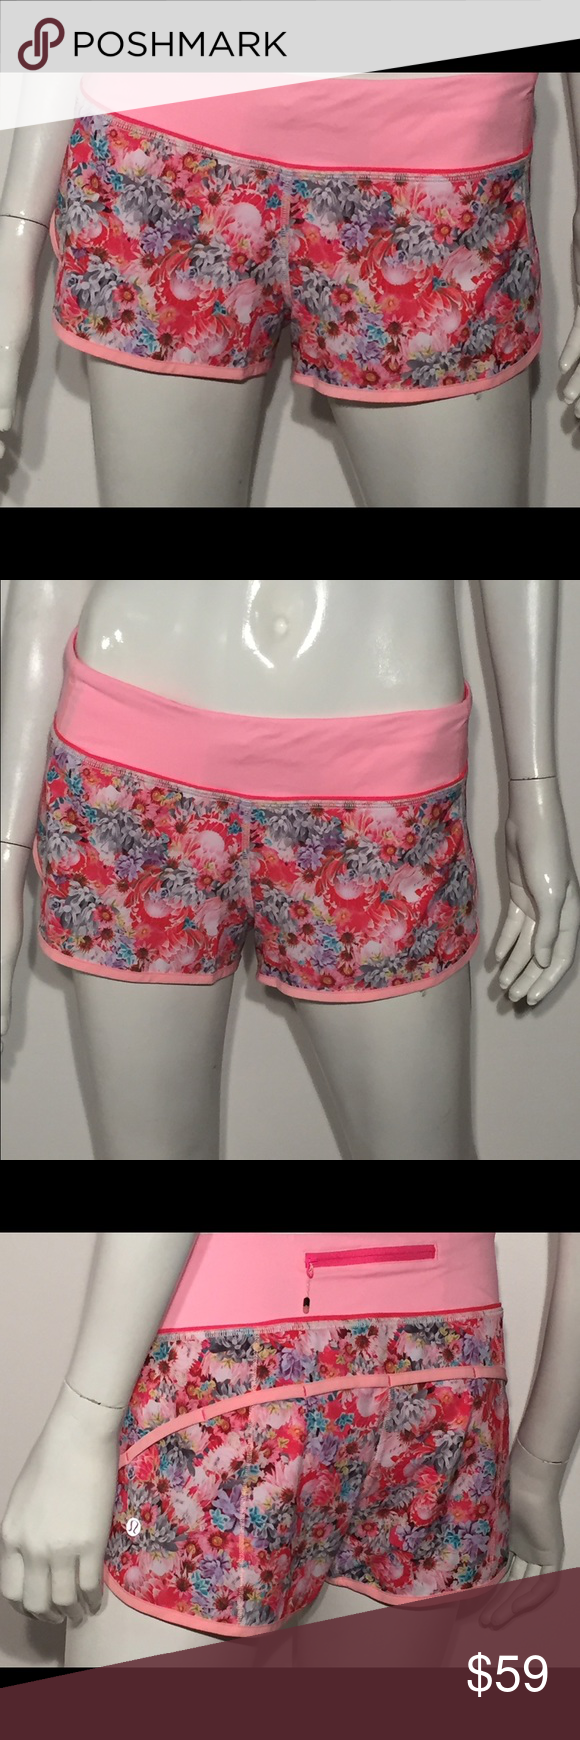 "LULULEMON wildflower run speed shorts size 6 Excellent like new condition only worn once!! 30"" waist x 3"" inseam lululemon athletica Shorts Skorts"